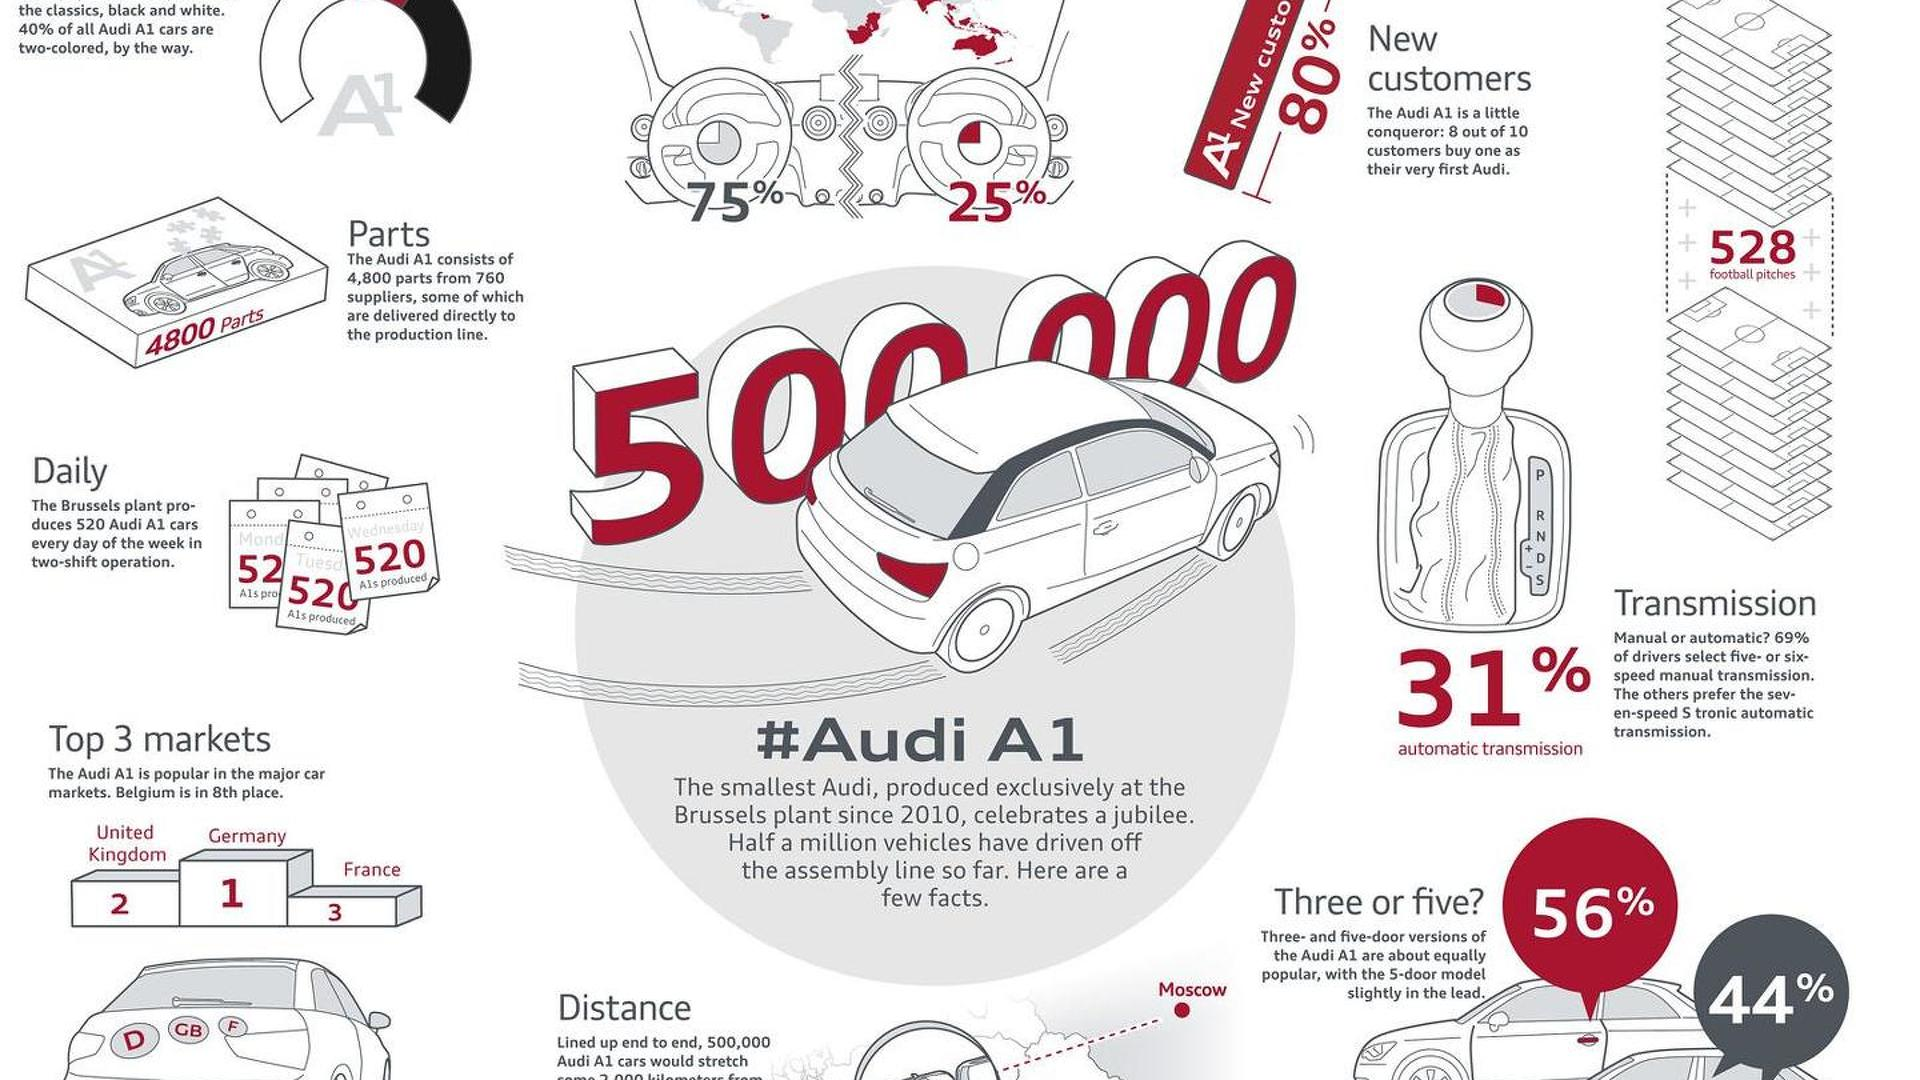 Статистика Ауди А1 в 2014 году от завода в Брюсселе